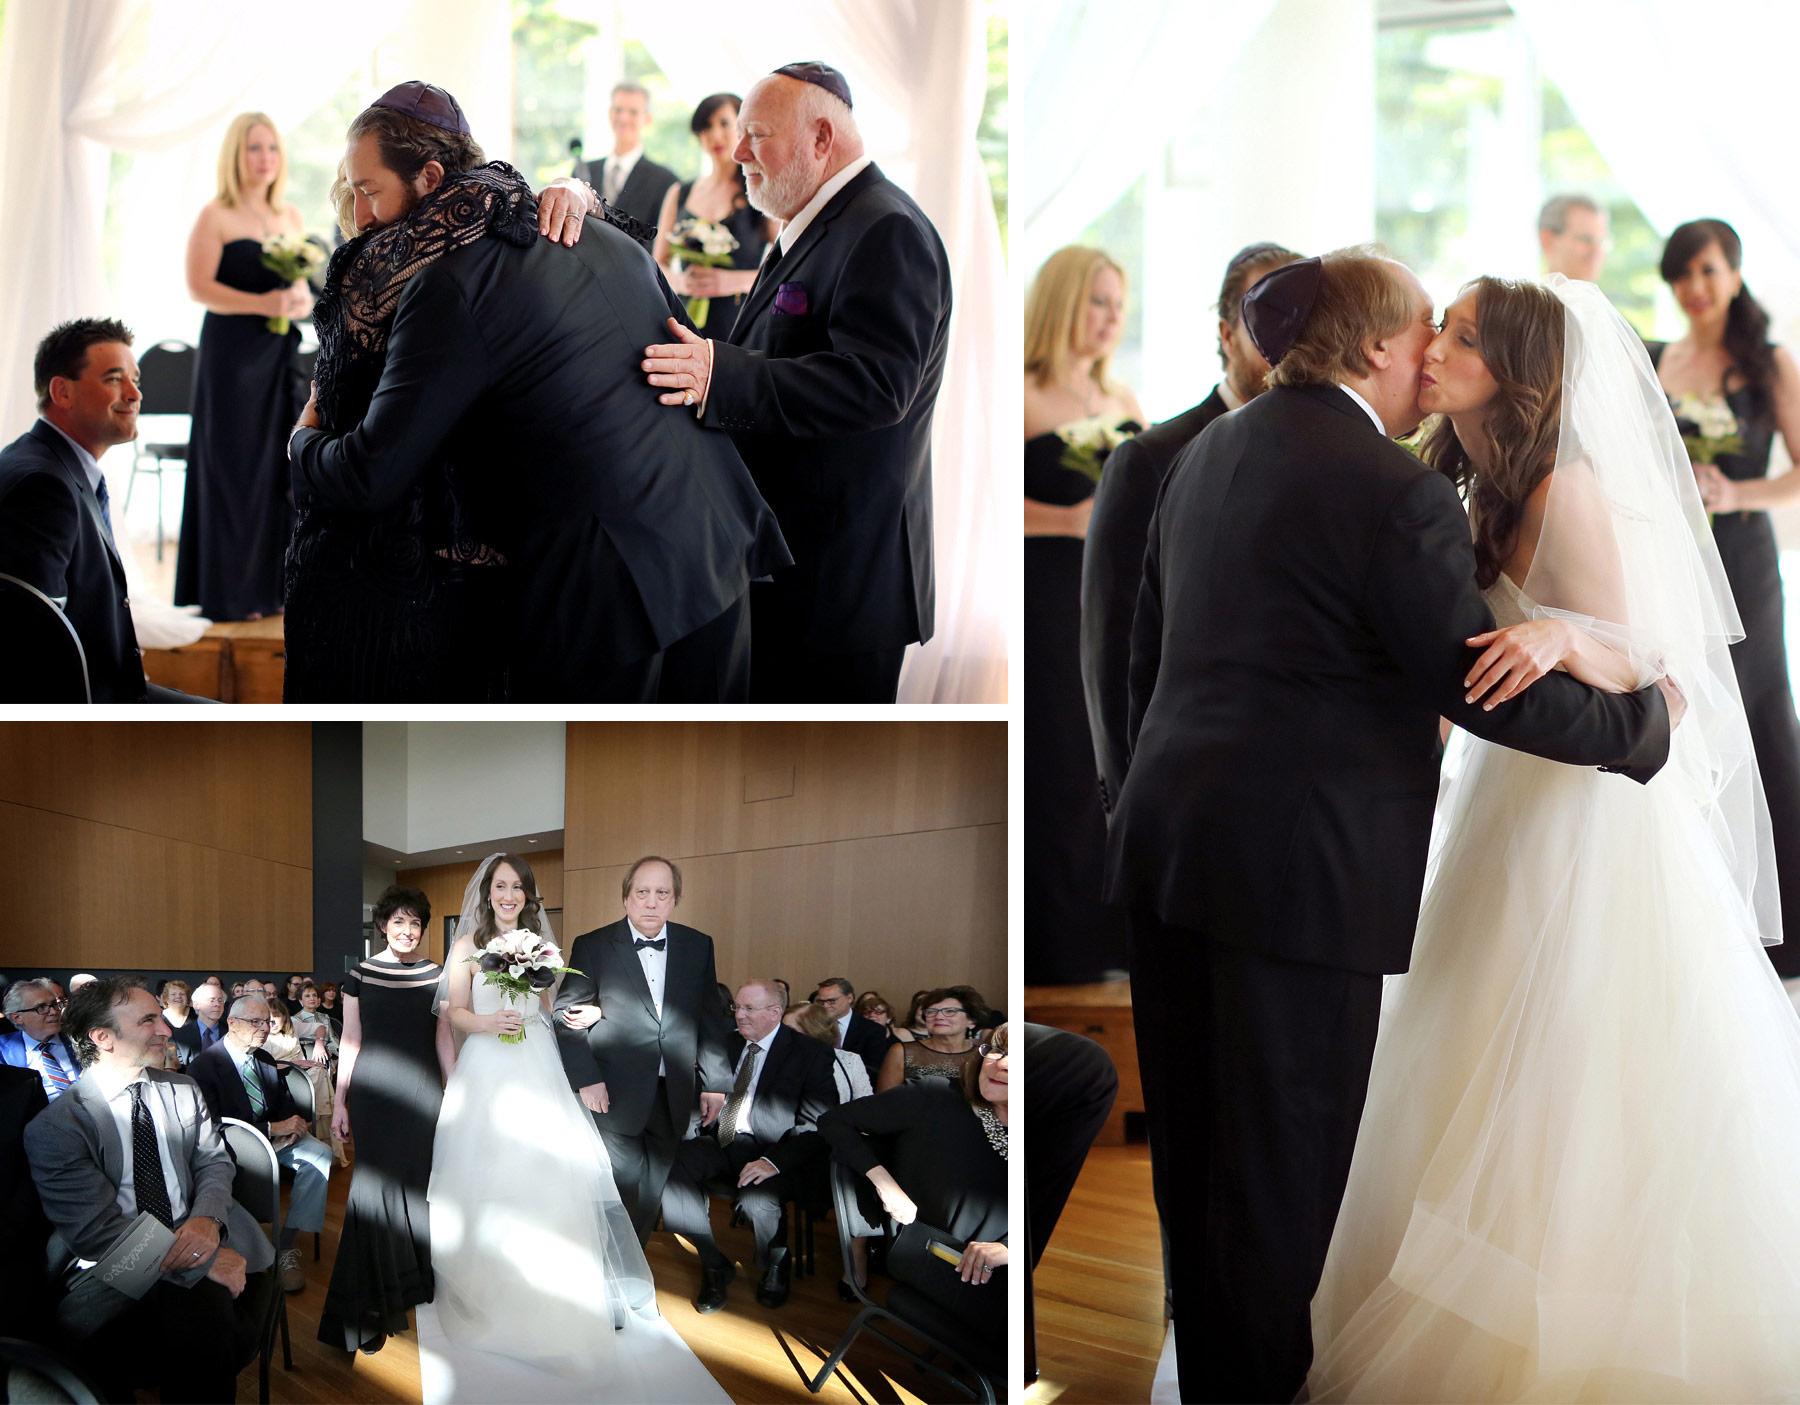 09-Minneapolis-Minnesota-Wedding-Photography-by-Vick-Photography-Hilton-Downtown-Ceremony-Lisa-and-Jared.jpg